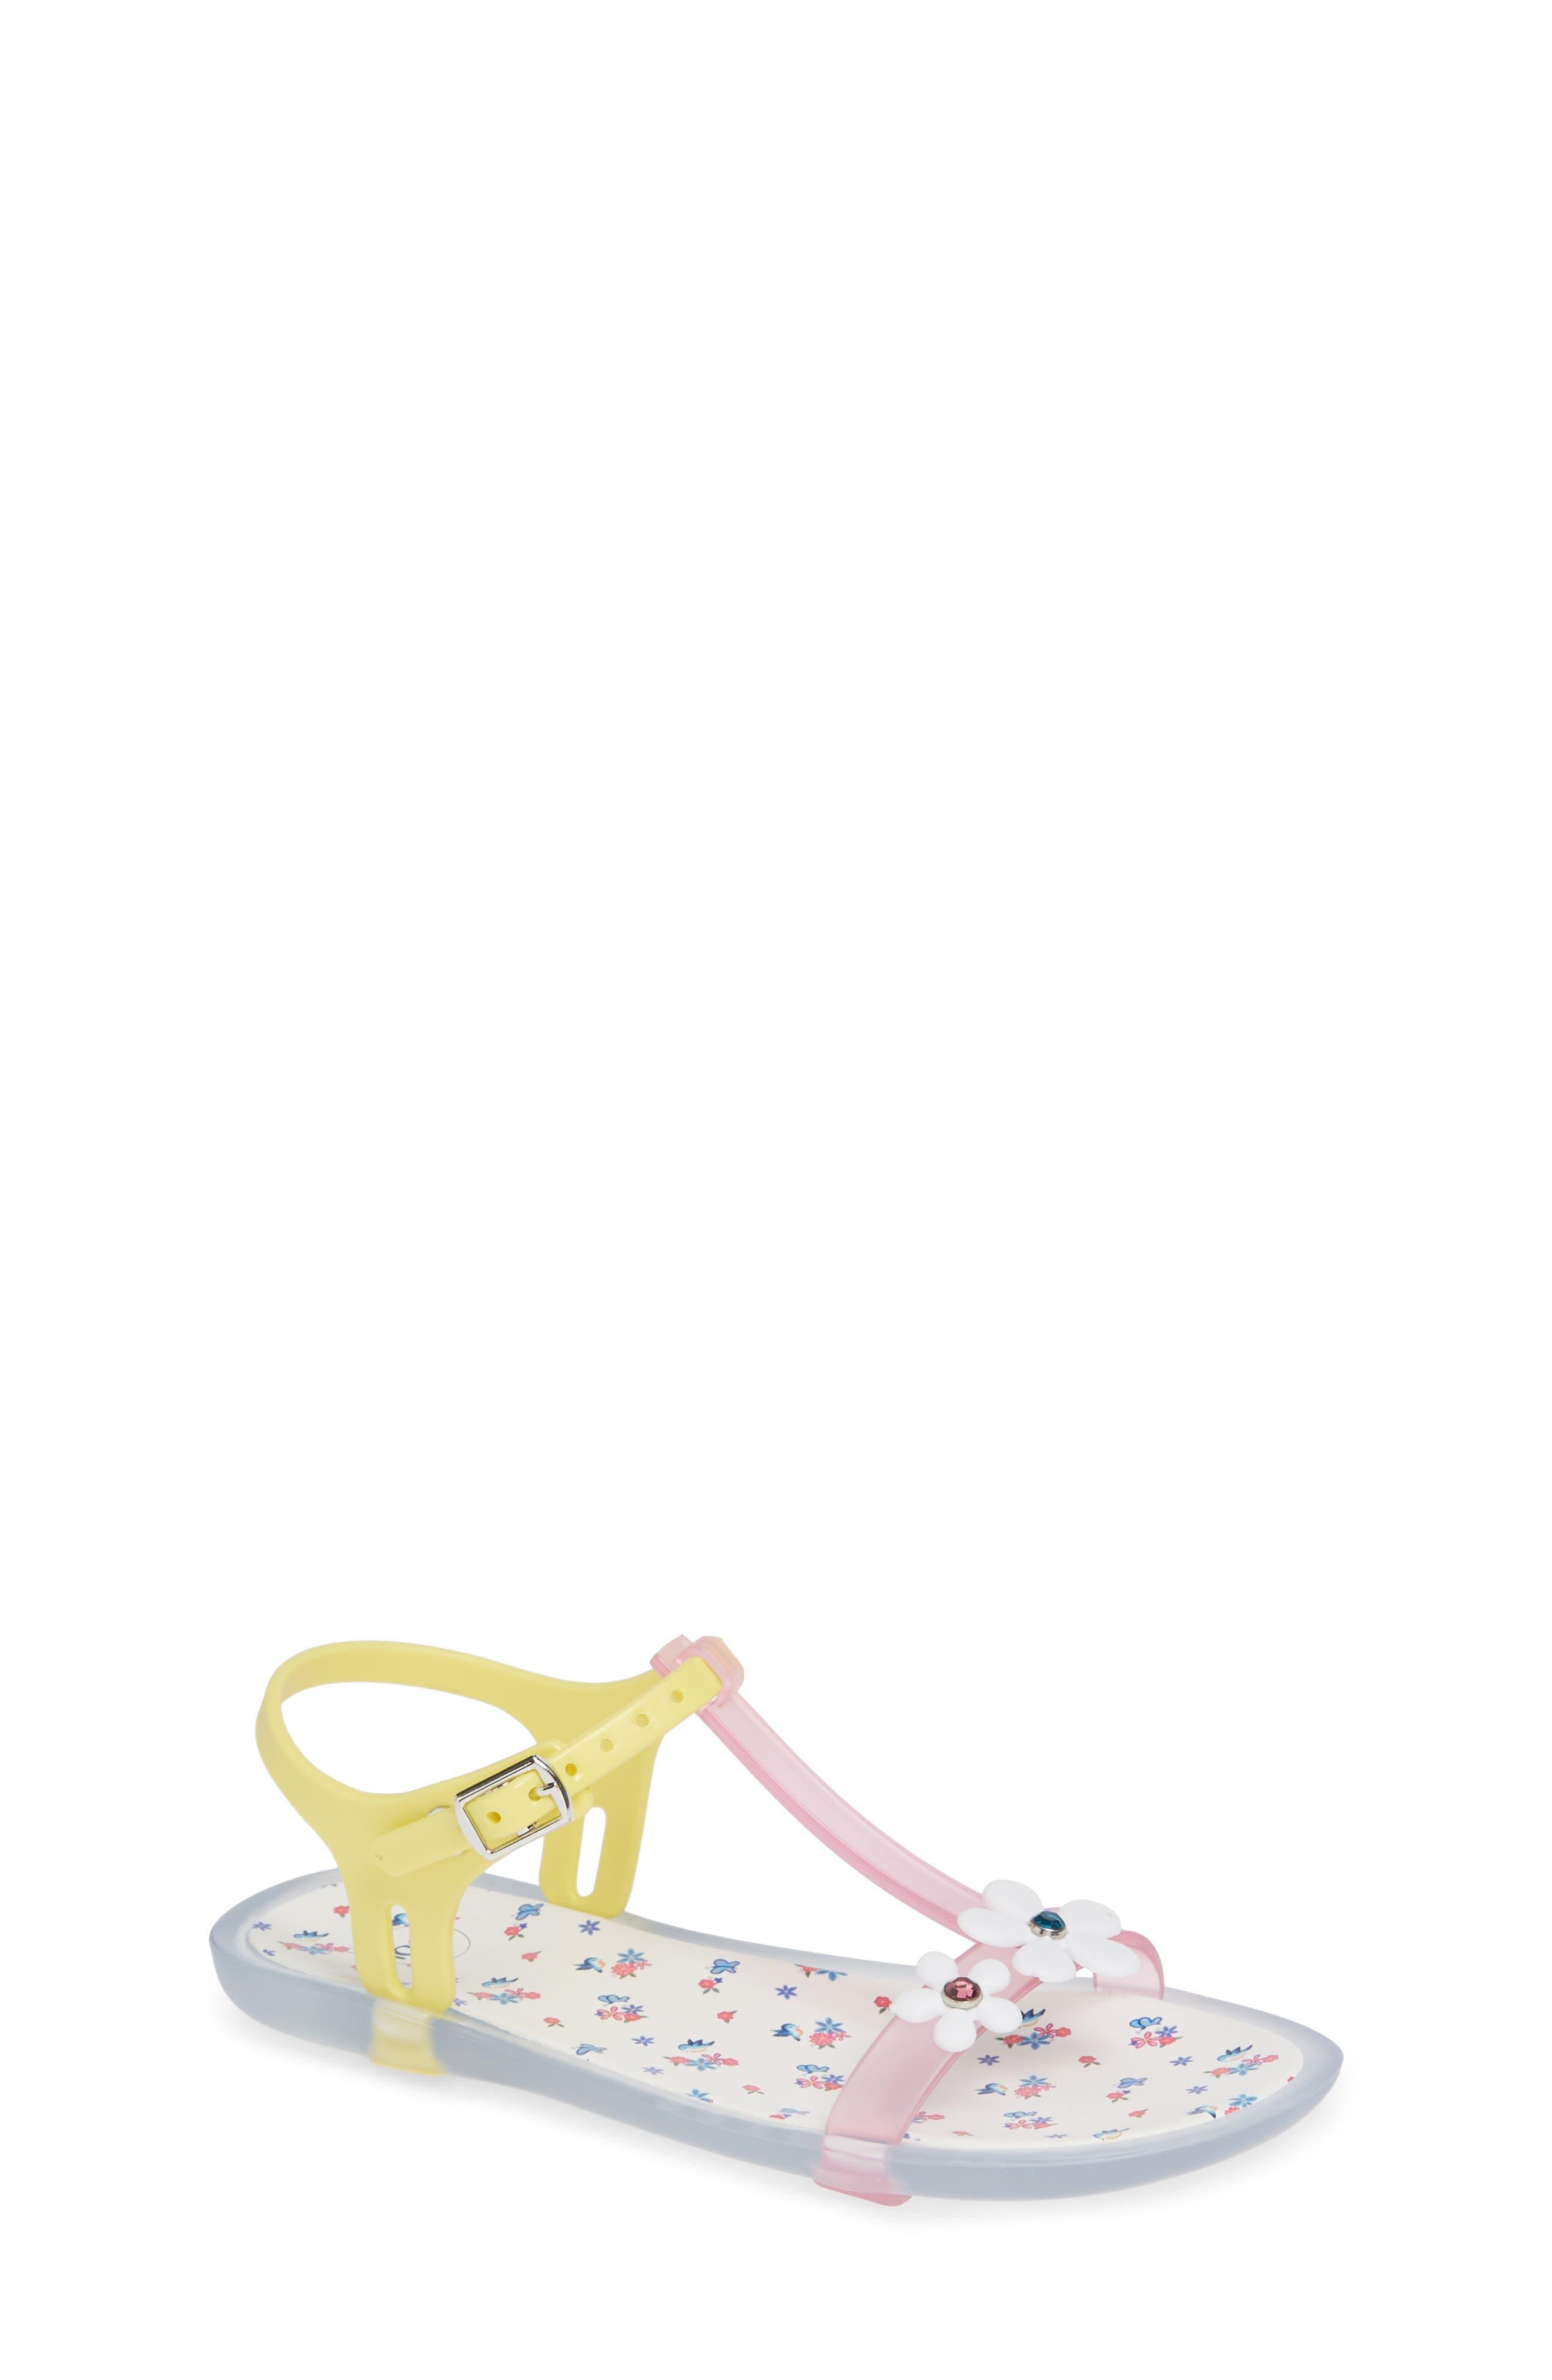 Tricia T-Strap Sandal,                             Main thumbnail 1, color,